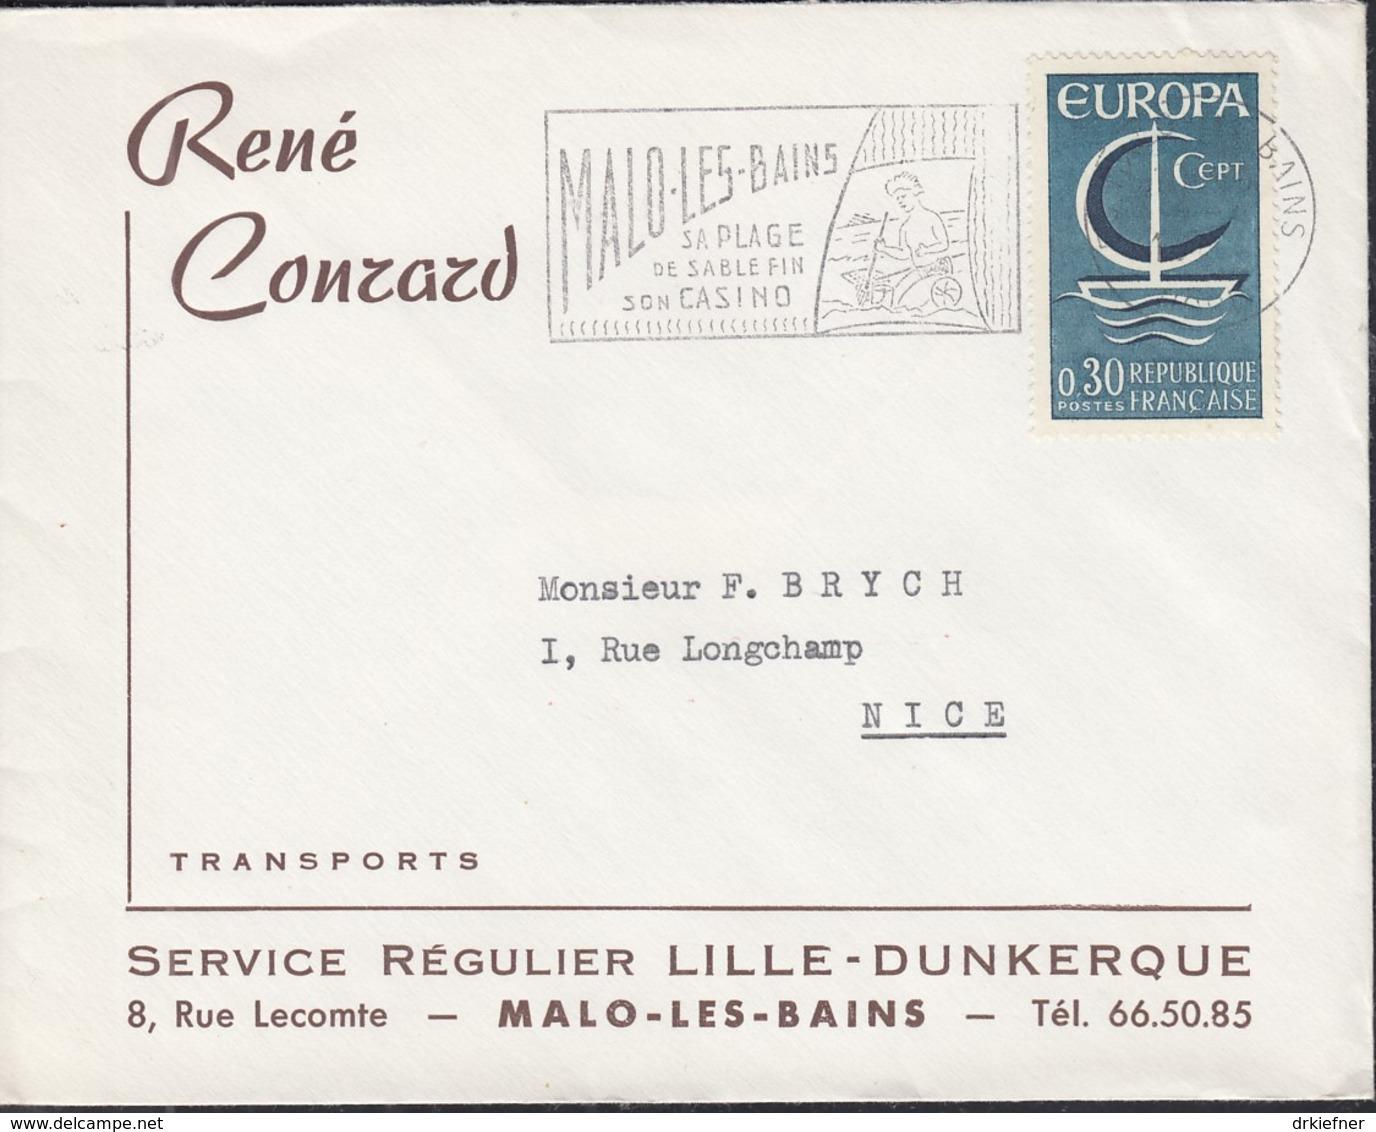 FRANKREICH 1556, Auf Brief Der Fa. René Conrad Mit Stempel: Malo Les Bains (1966), Europa CEPT 1966 - Frankreich